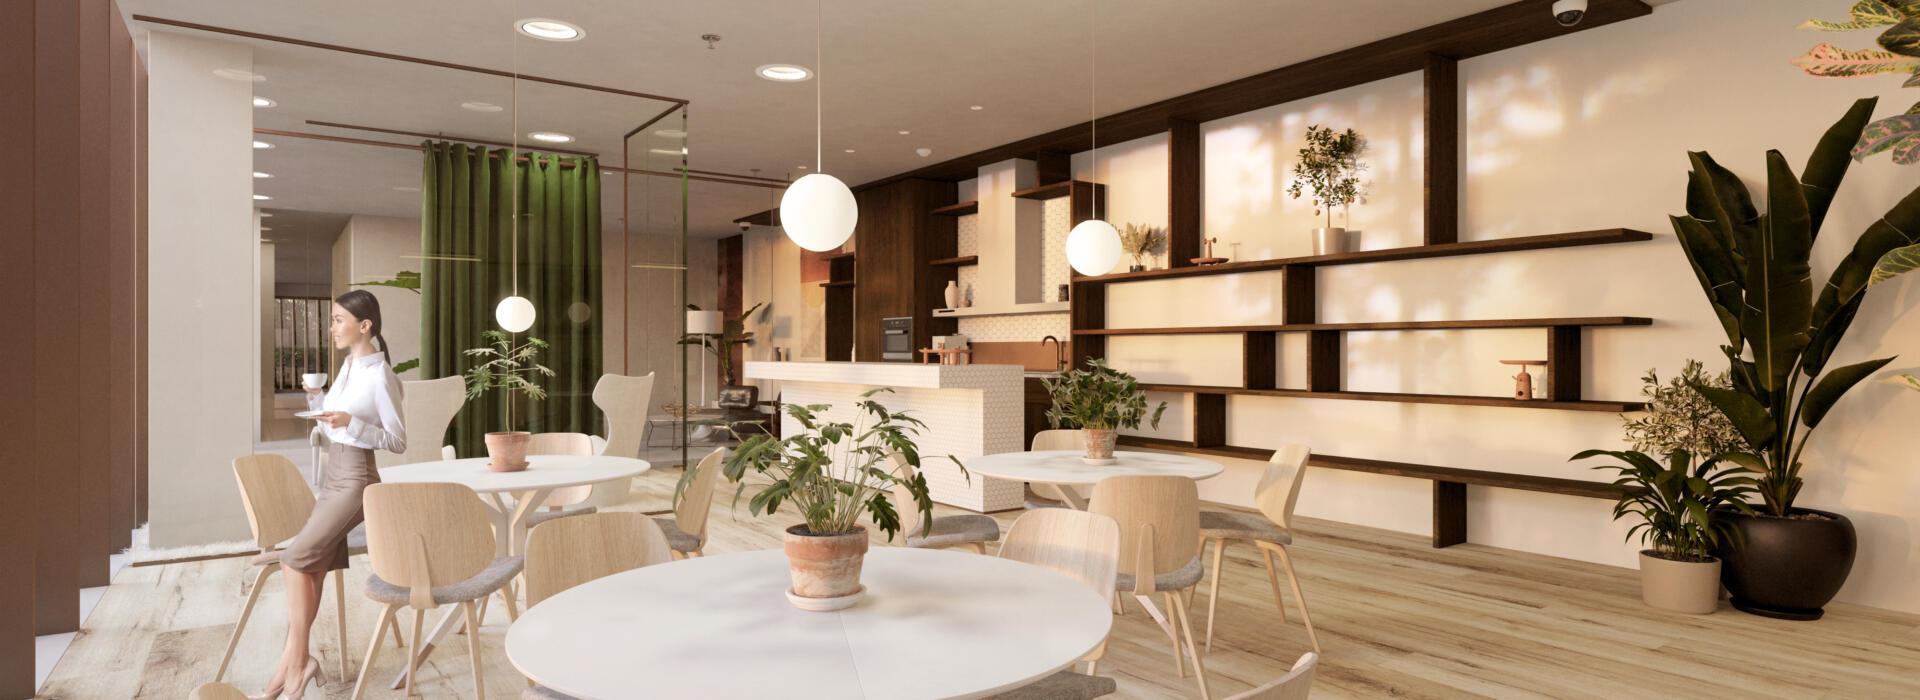 kitchenette lounge 9